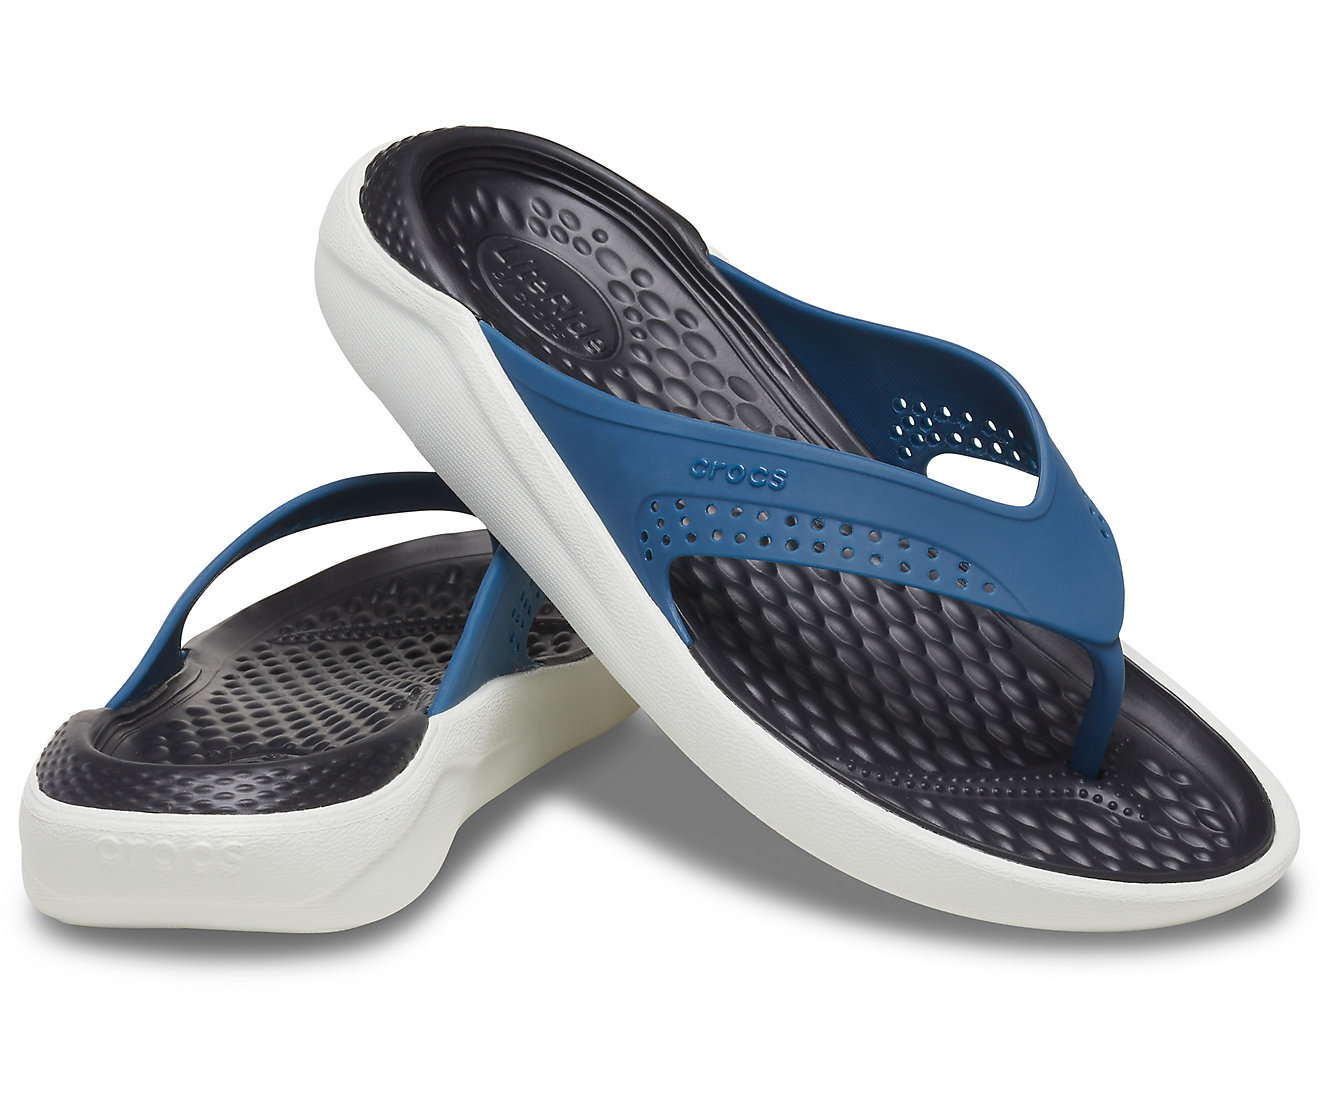 Chinelo Crocs Literide Flip